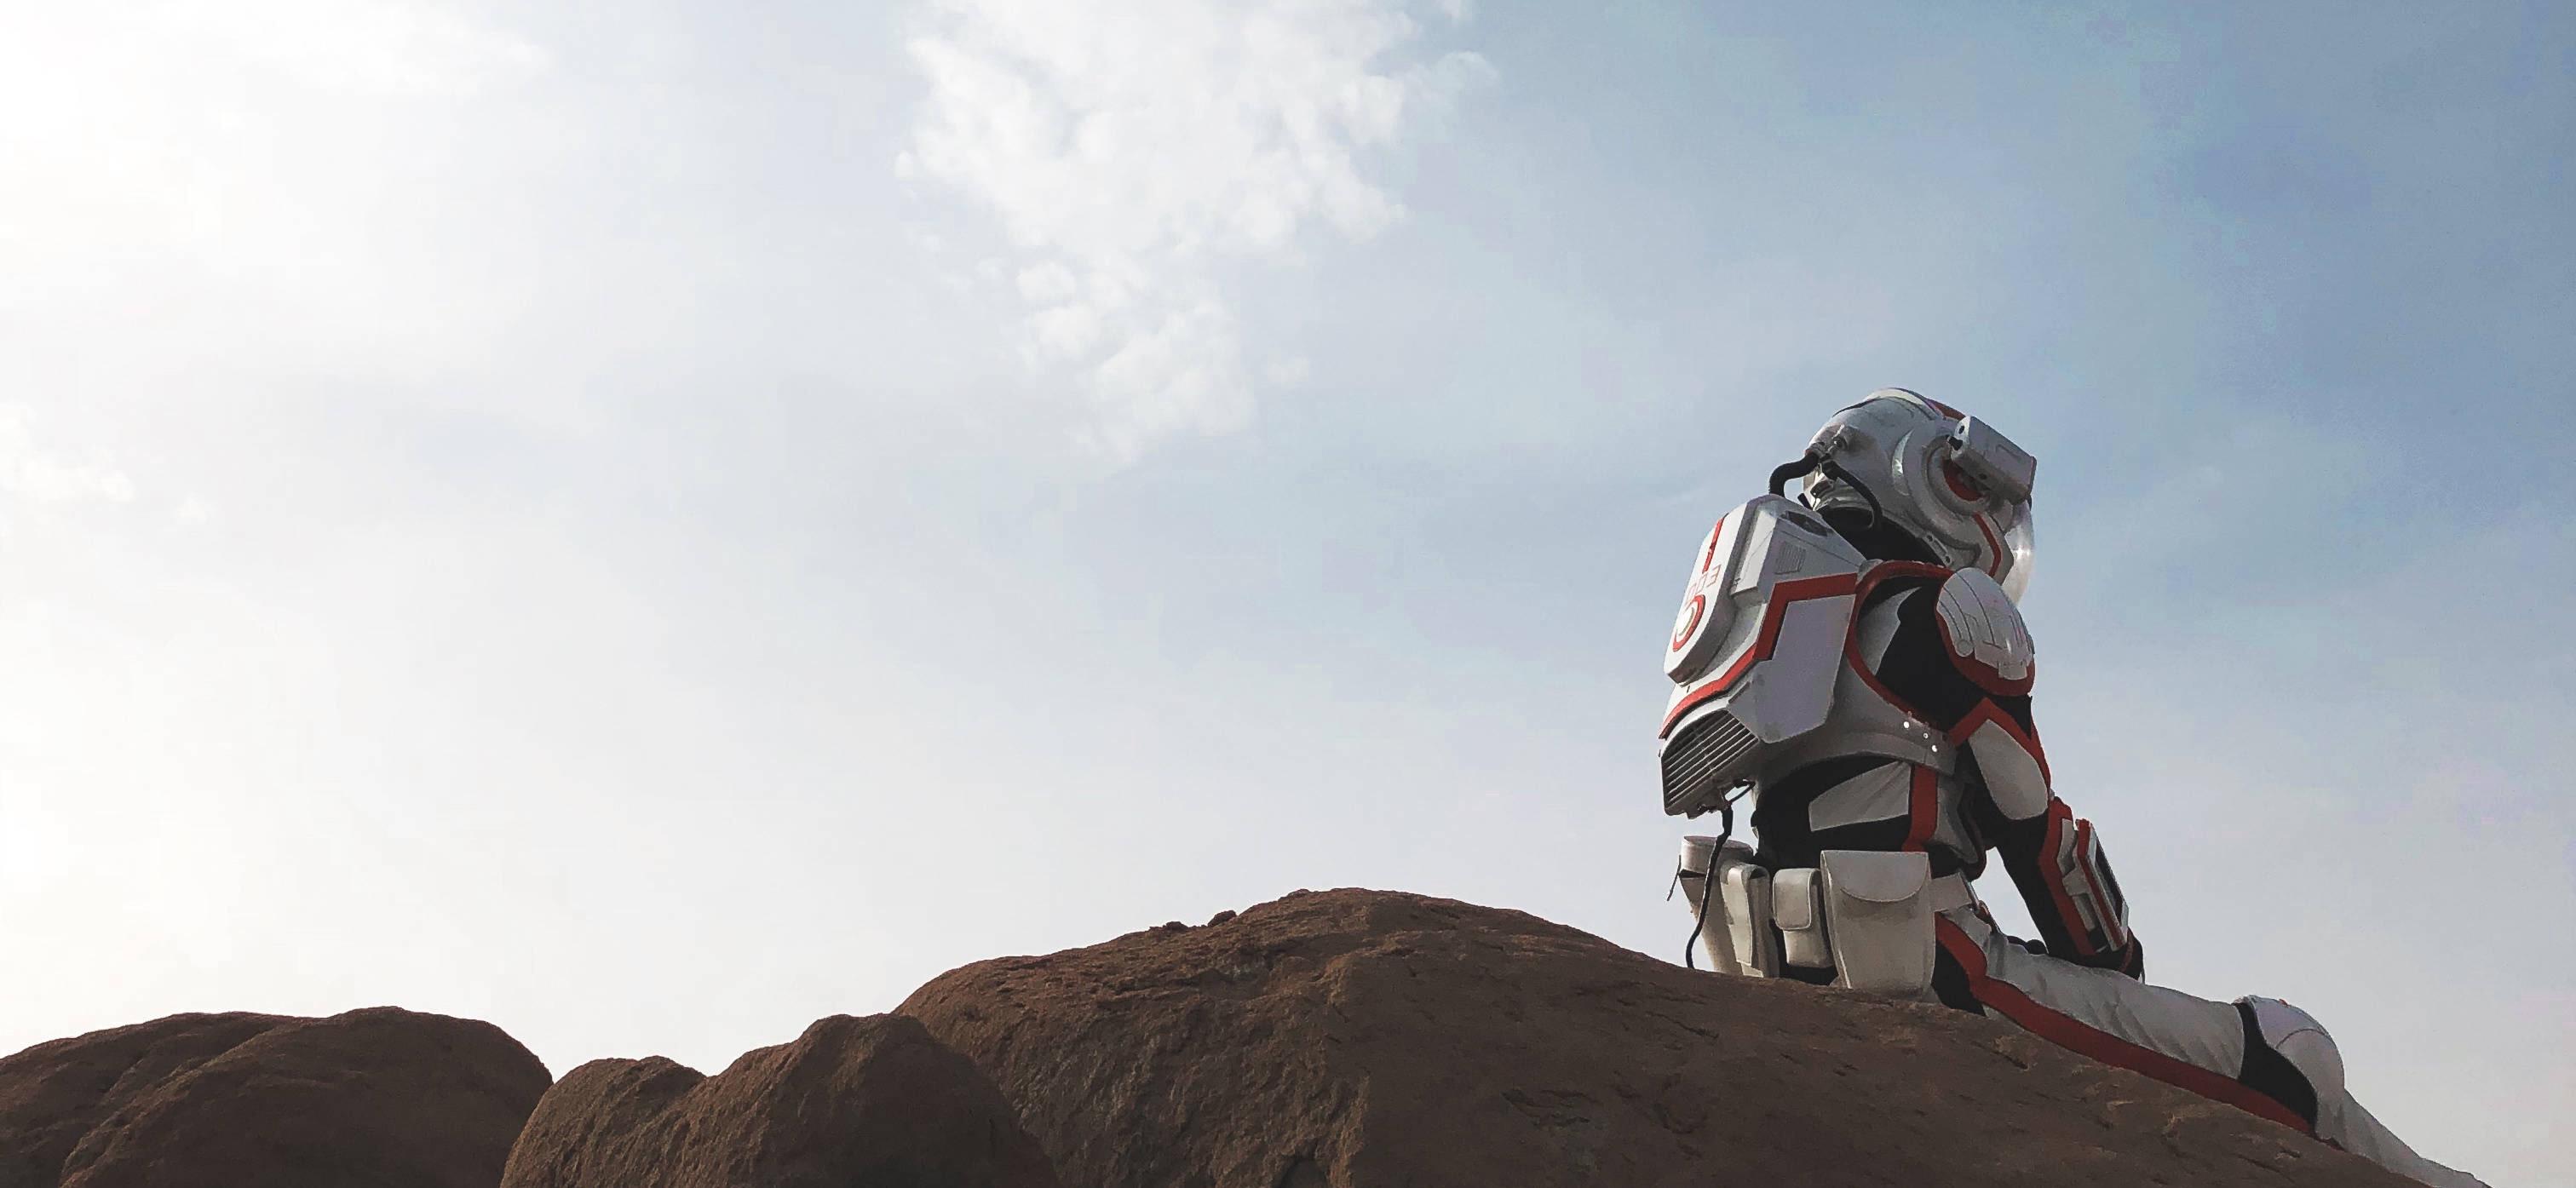 Han 的個人封面